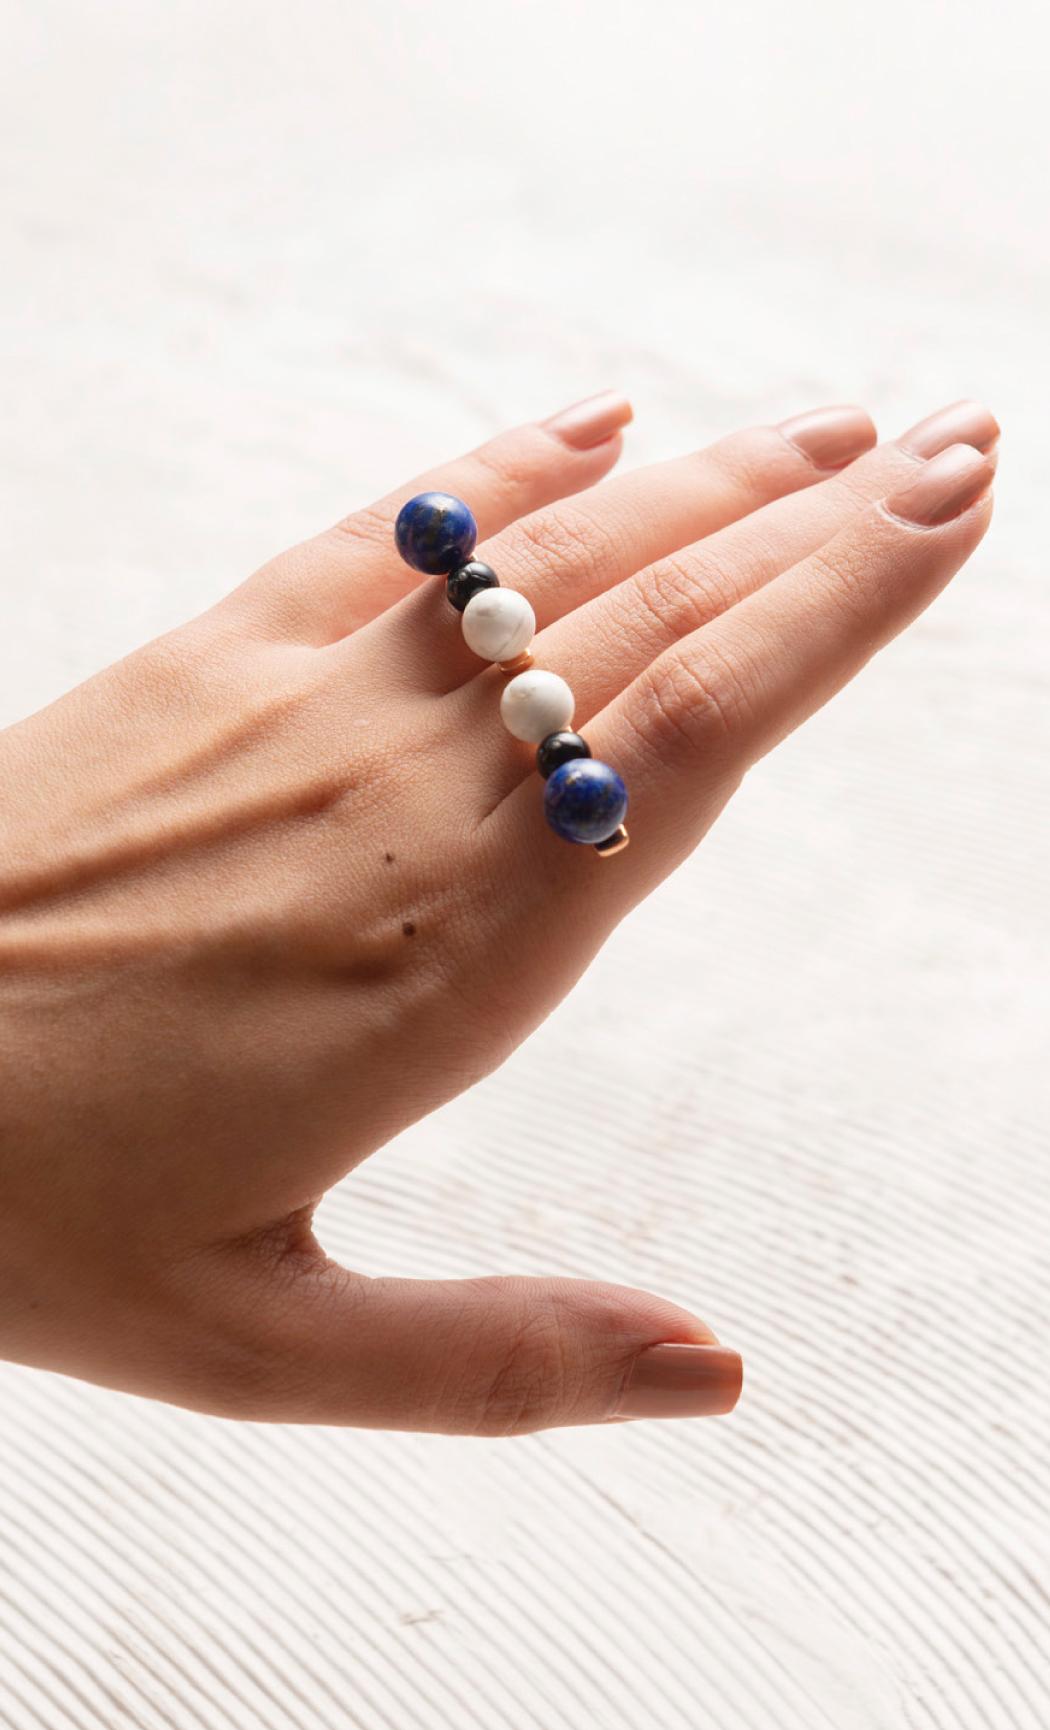 Three-finger Ball Ring - Buy Now.